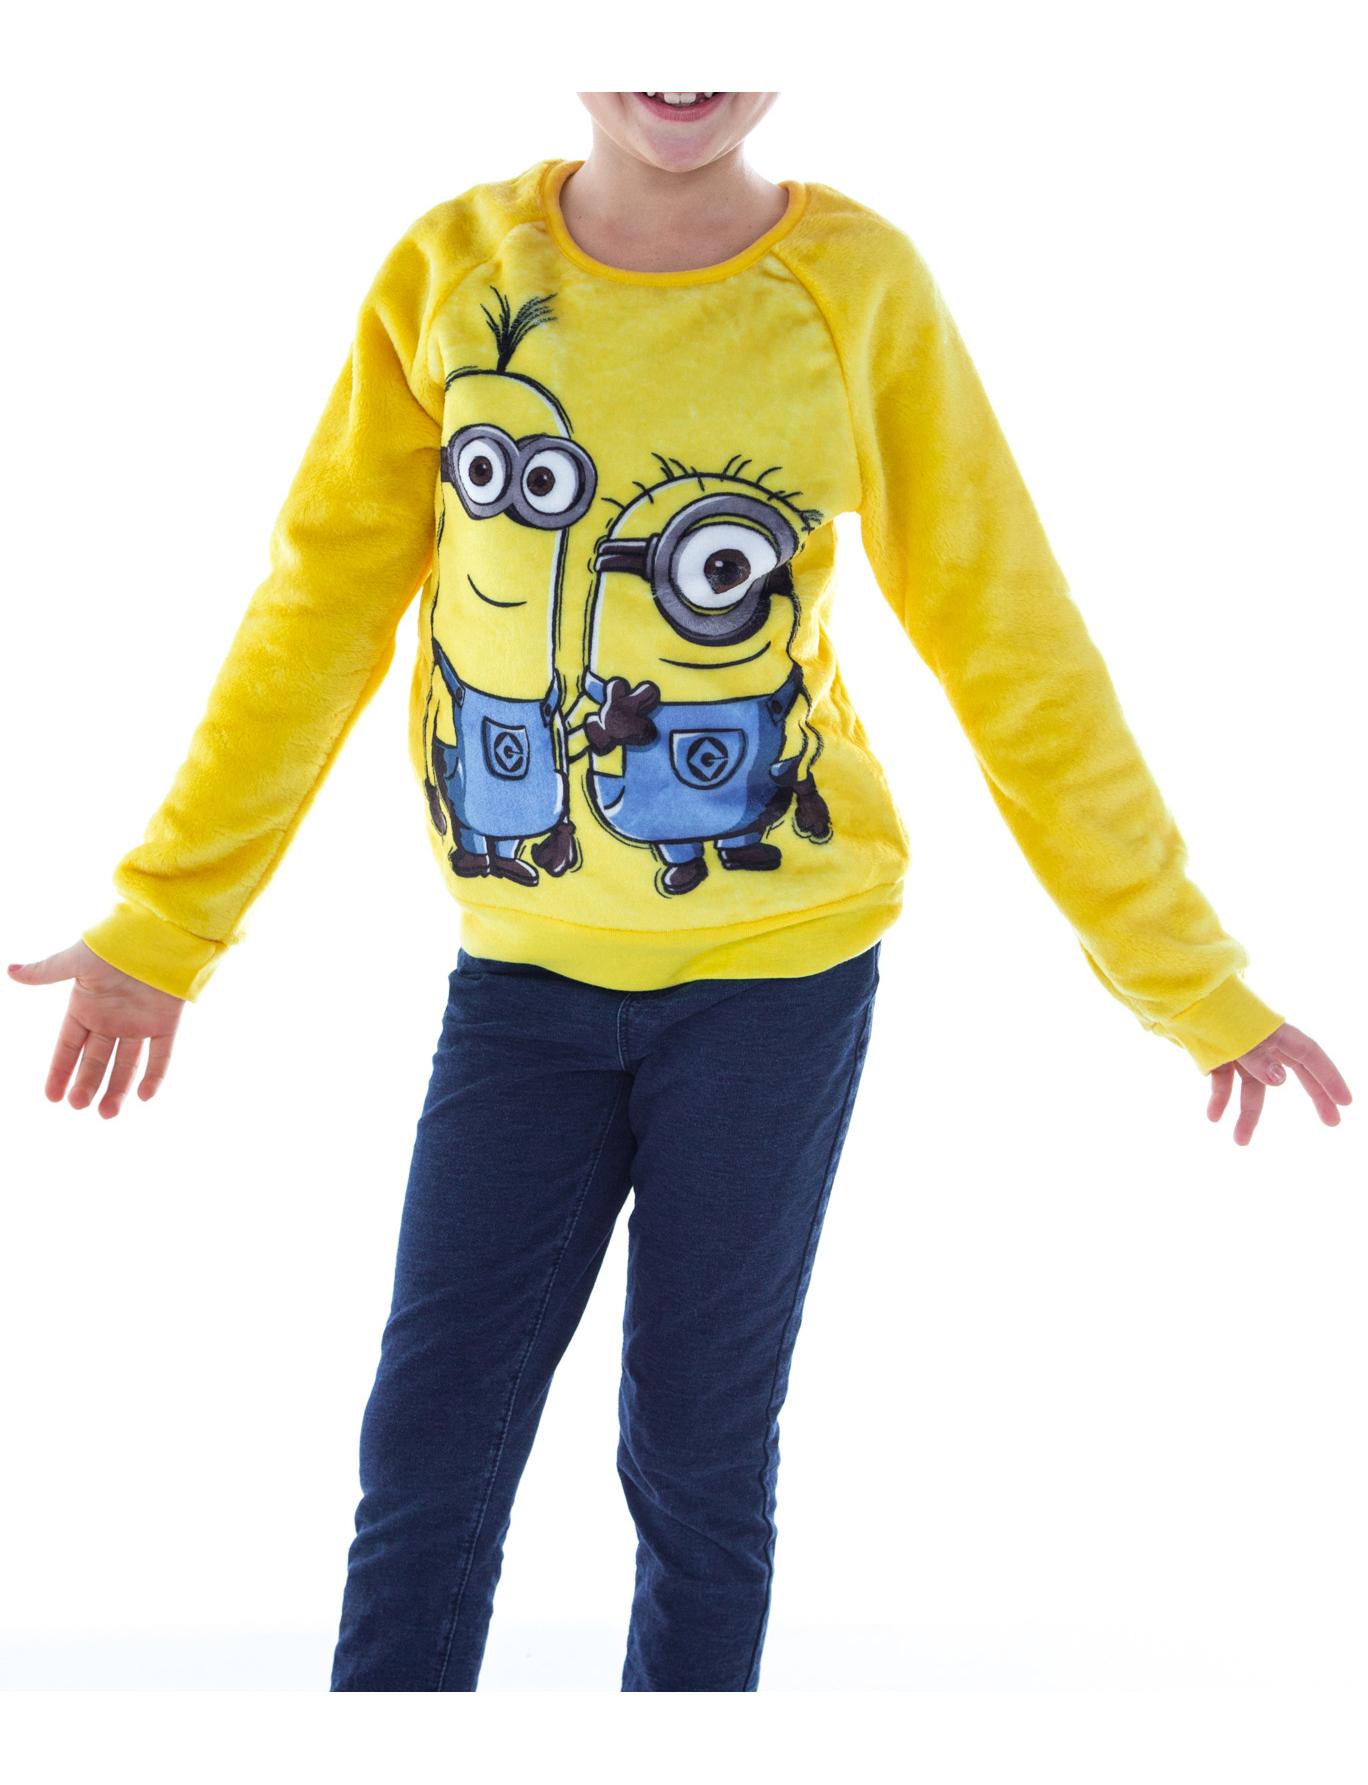 Girls Minions Plush Fleece Sweatshirt Yellow